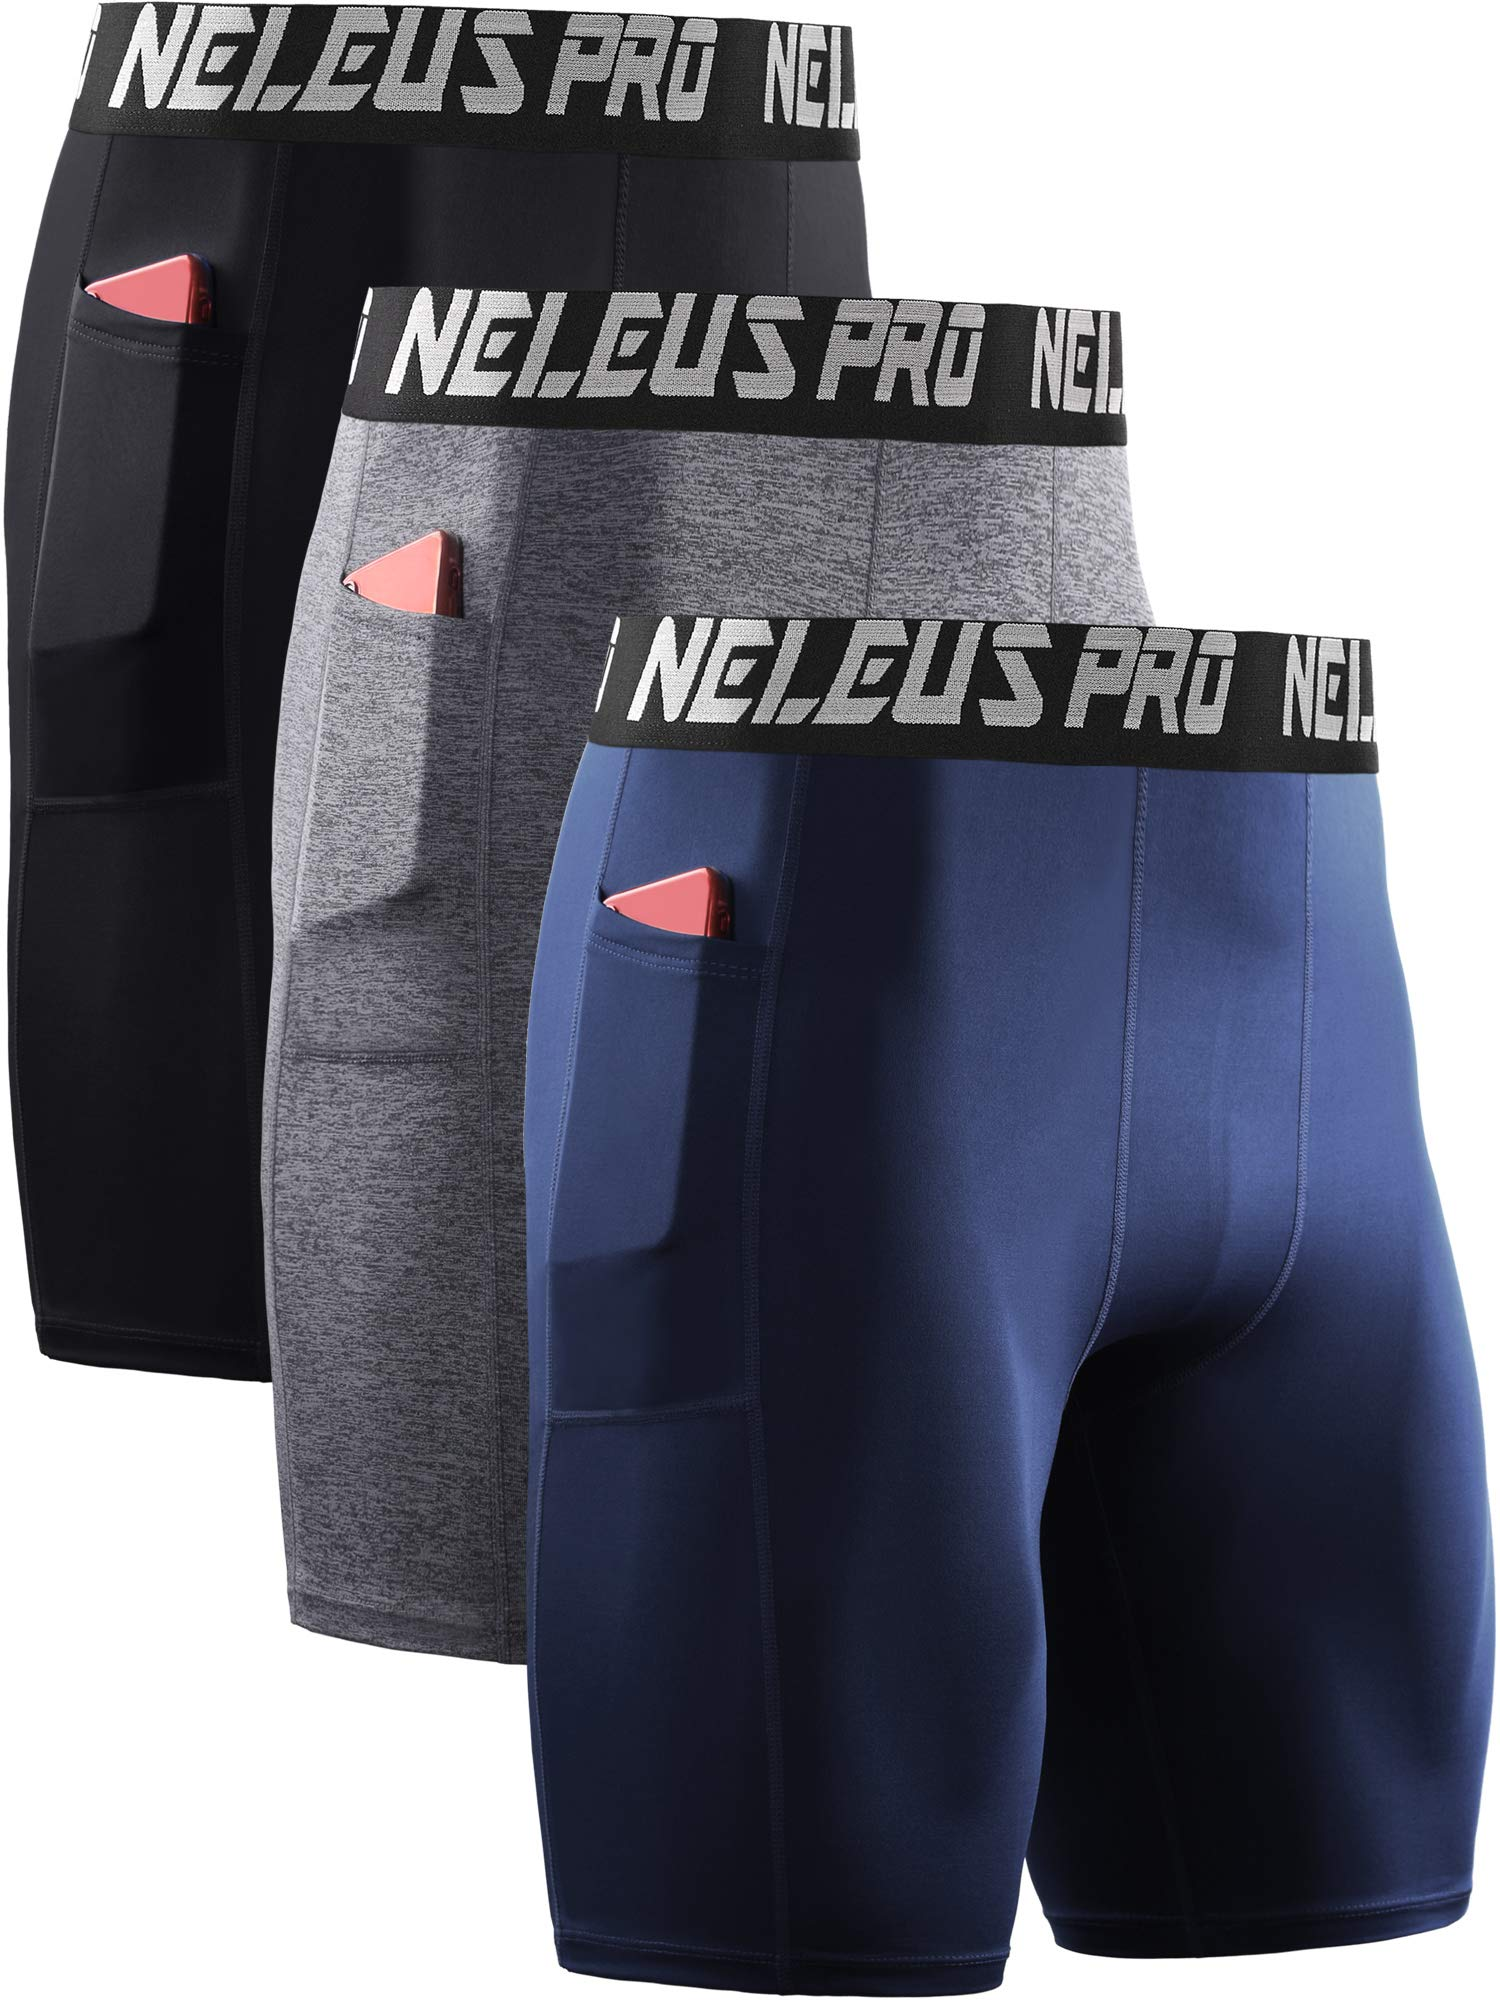 Neleus Men's 3 Pack Compression Shorts with Pockets,6063,Black/Grey/Navy Blue,US L,EU XL by Neleus